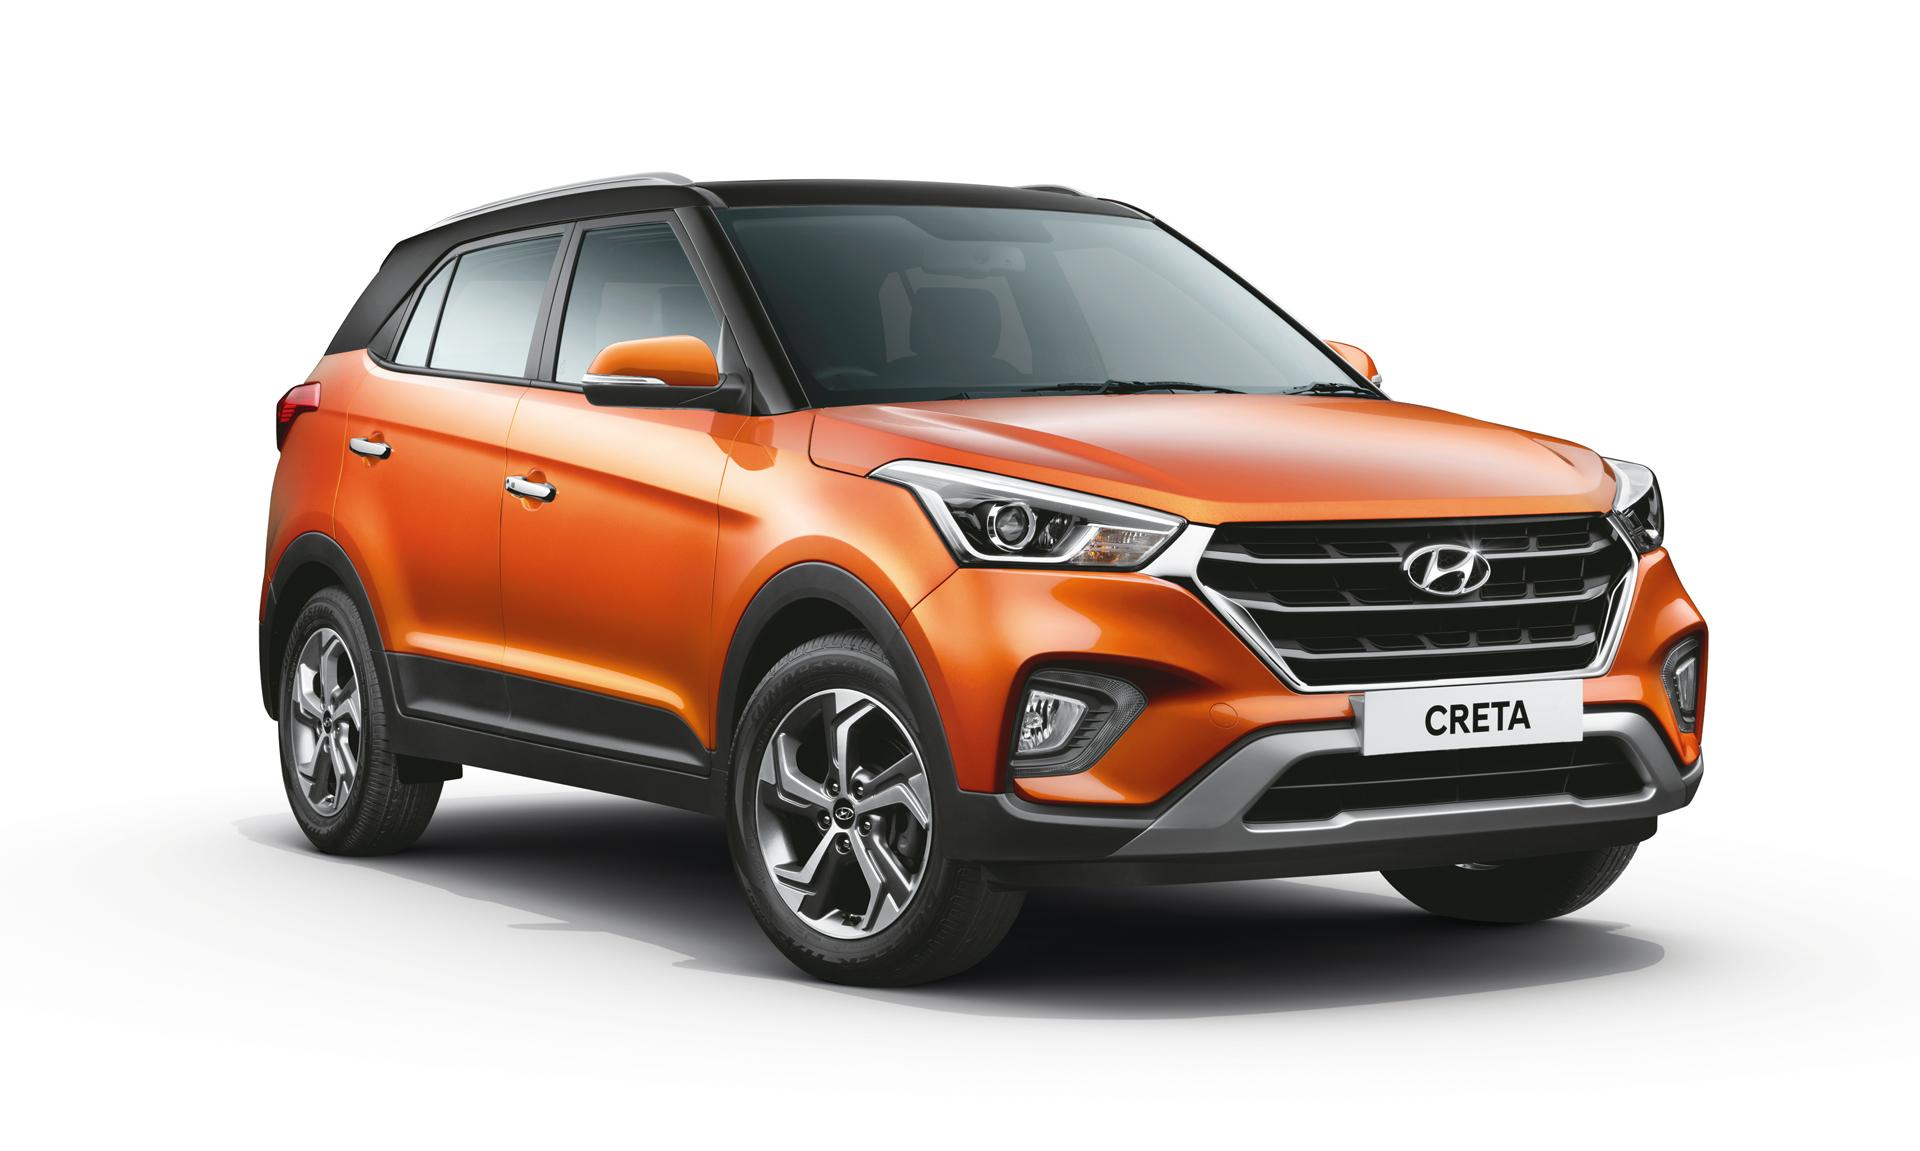 Hyundai Creta 2018 SX 1.6 Petrol Image